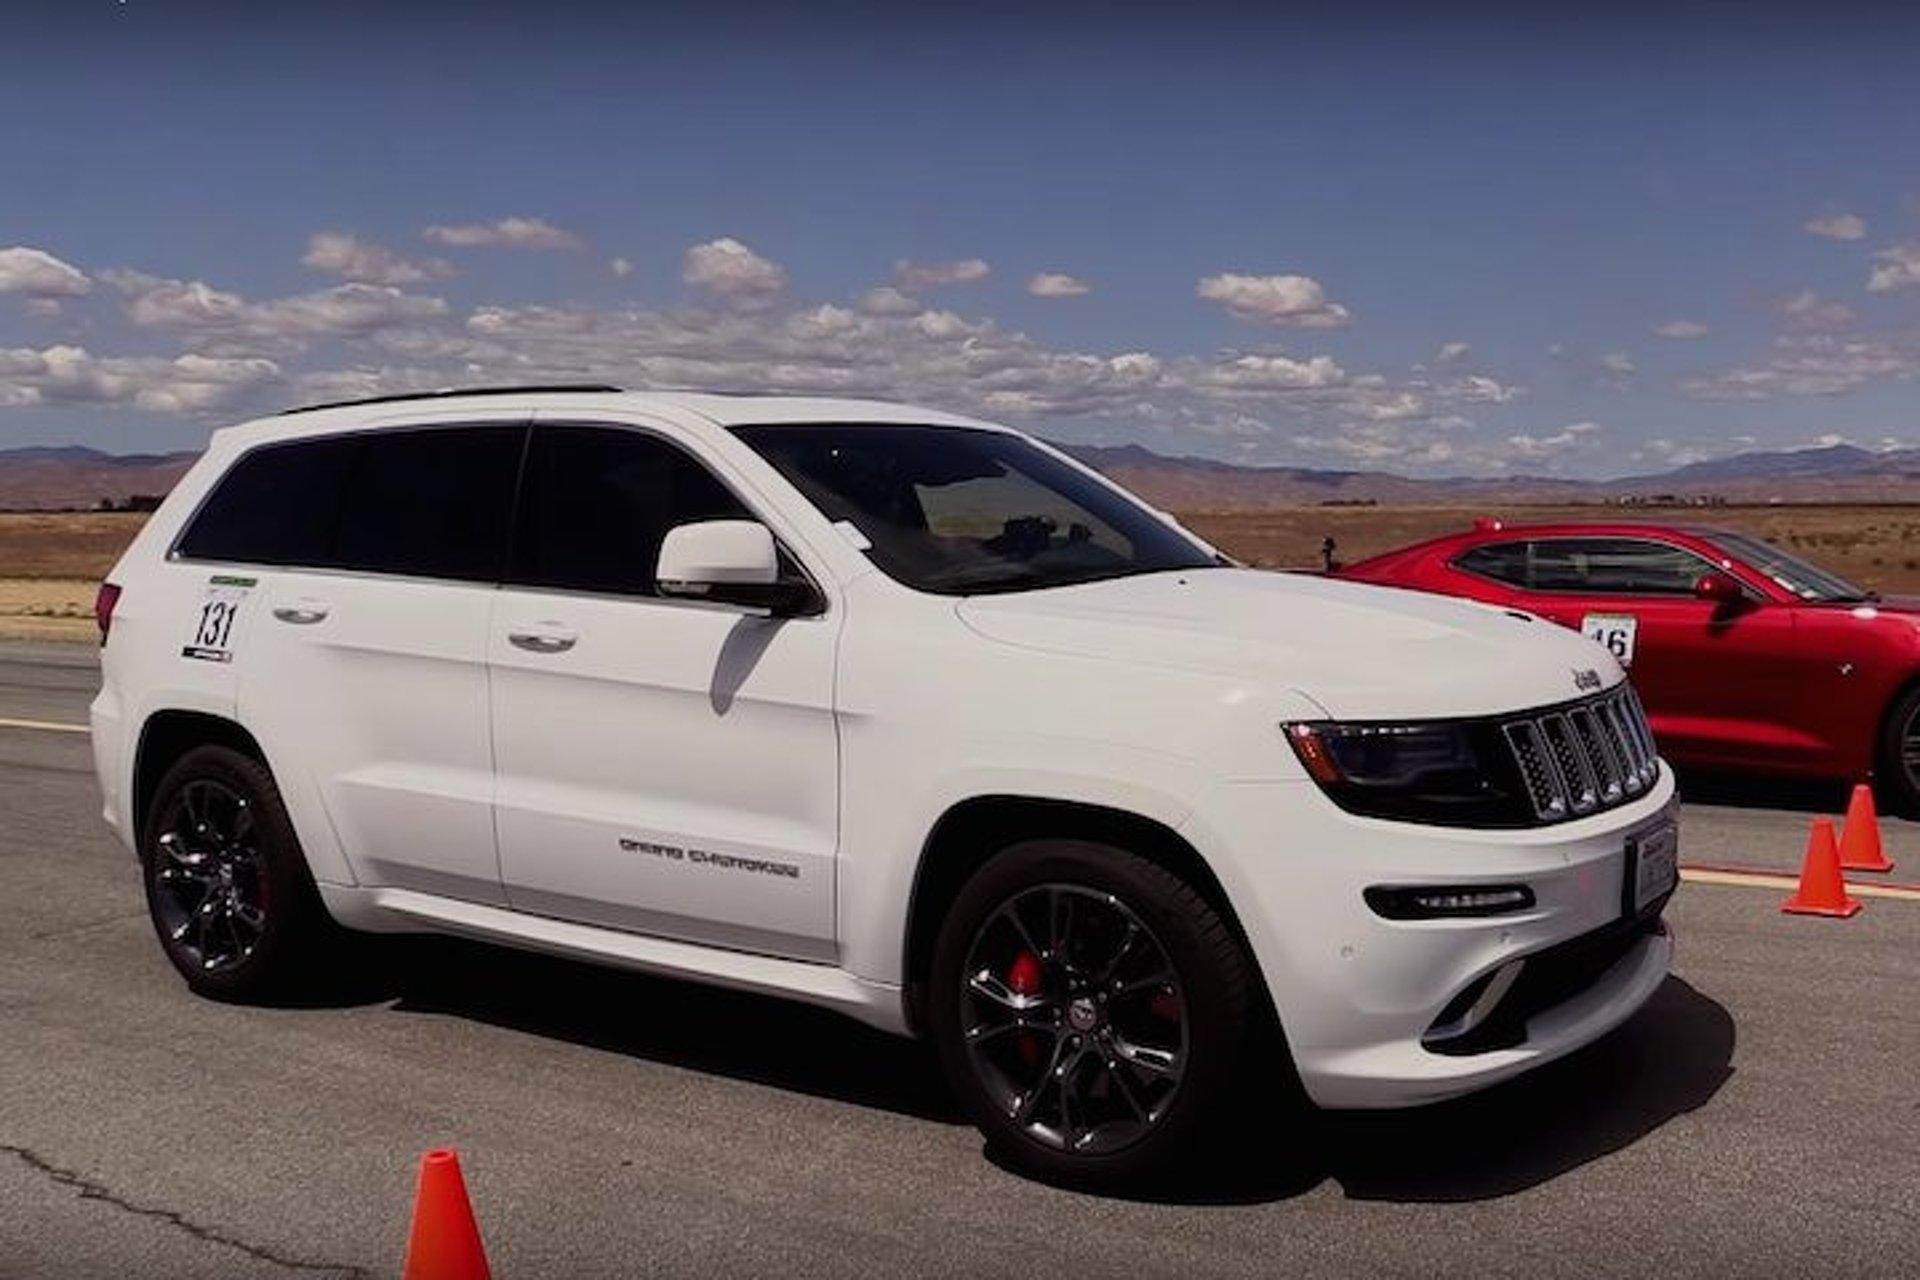 2016 Camaro SS vs Grand Cherokee SRT: Can Jeep Hang Tough?